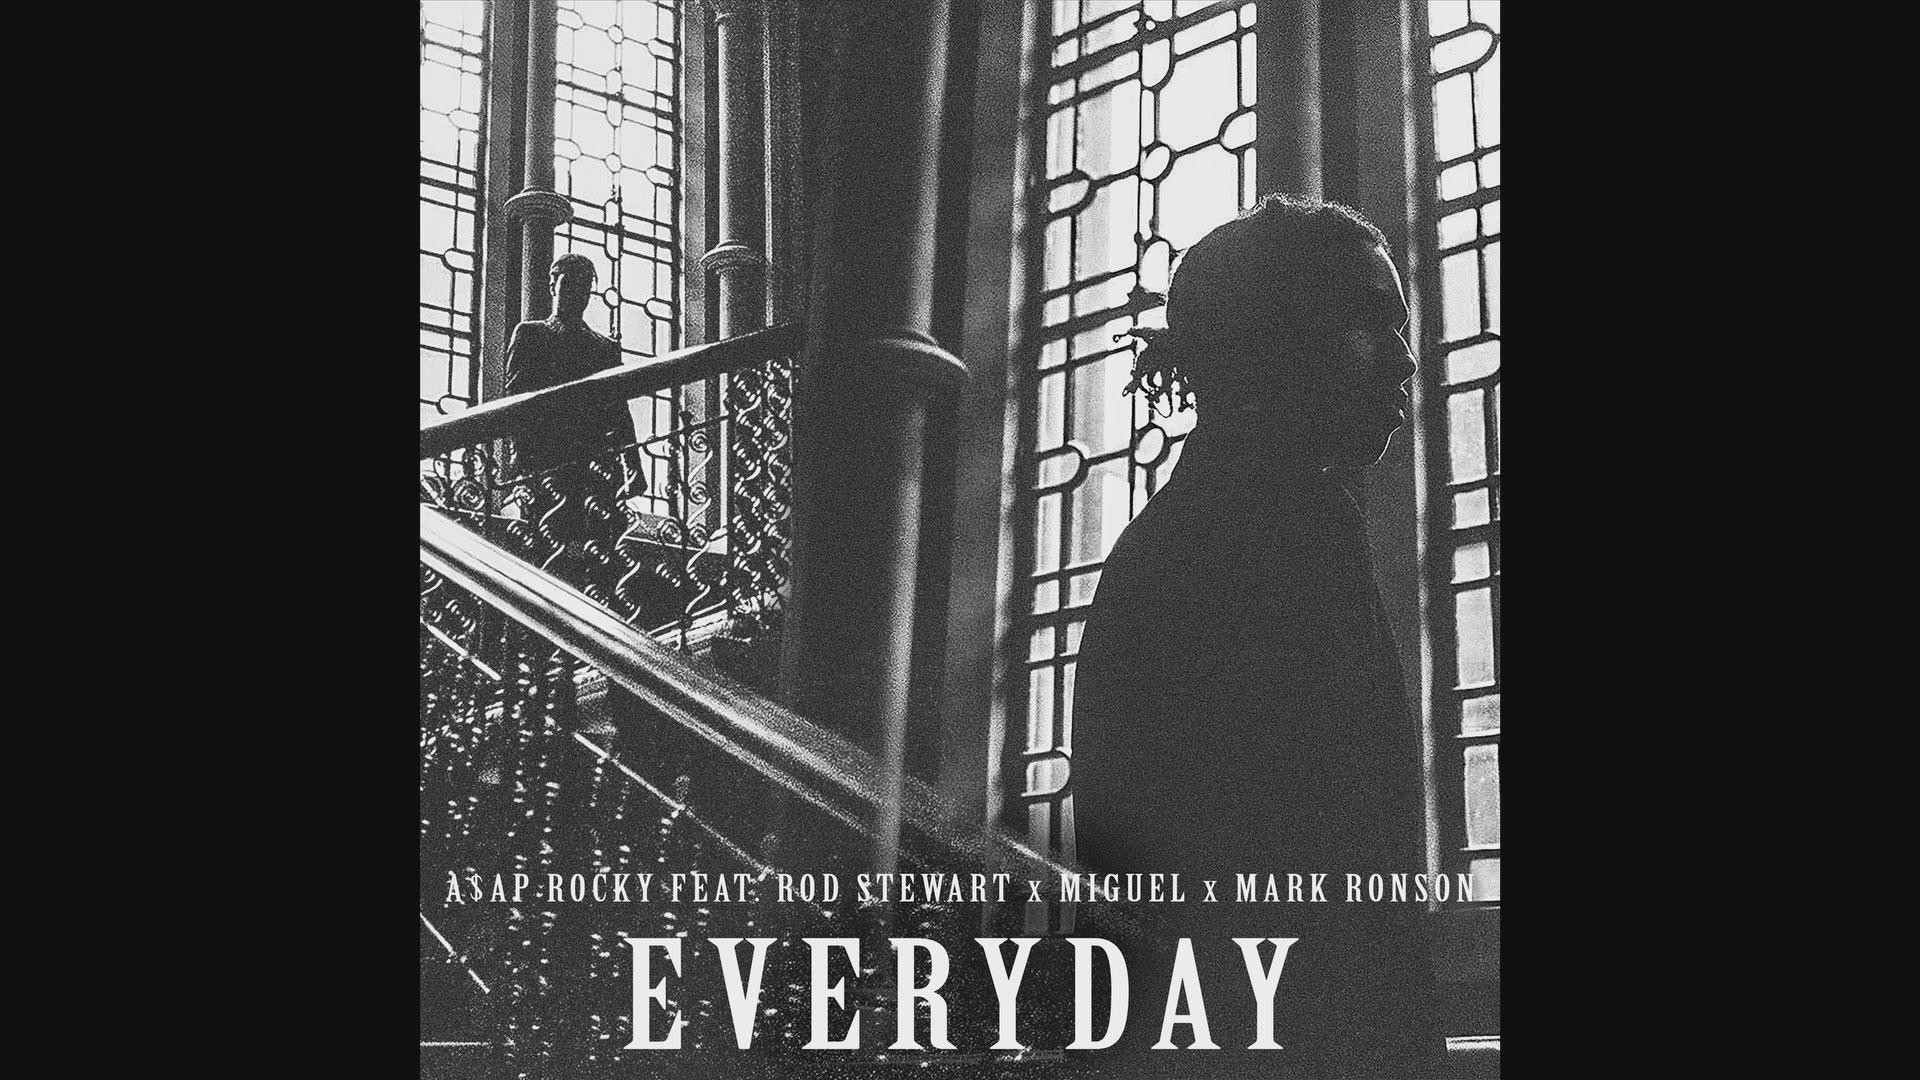 A$ap Rocky – Everyday Ft. Rod Steward & Mark Ronson Audio